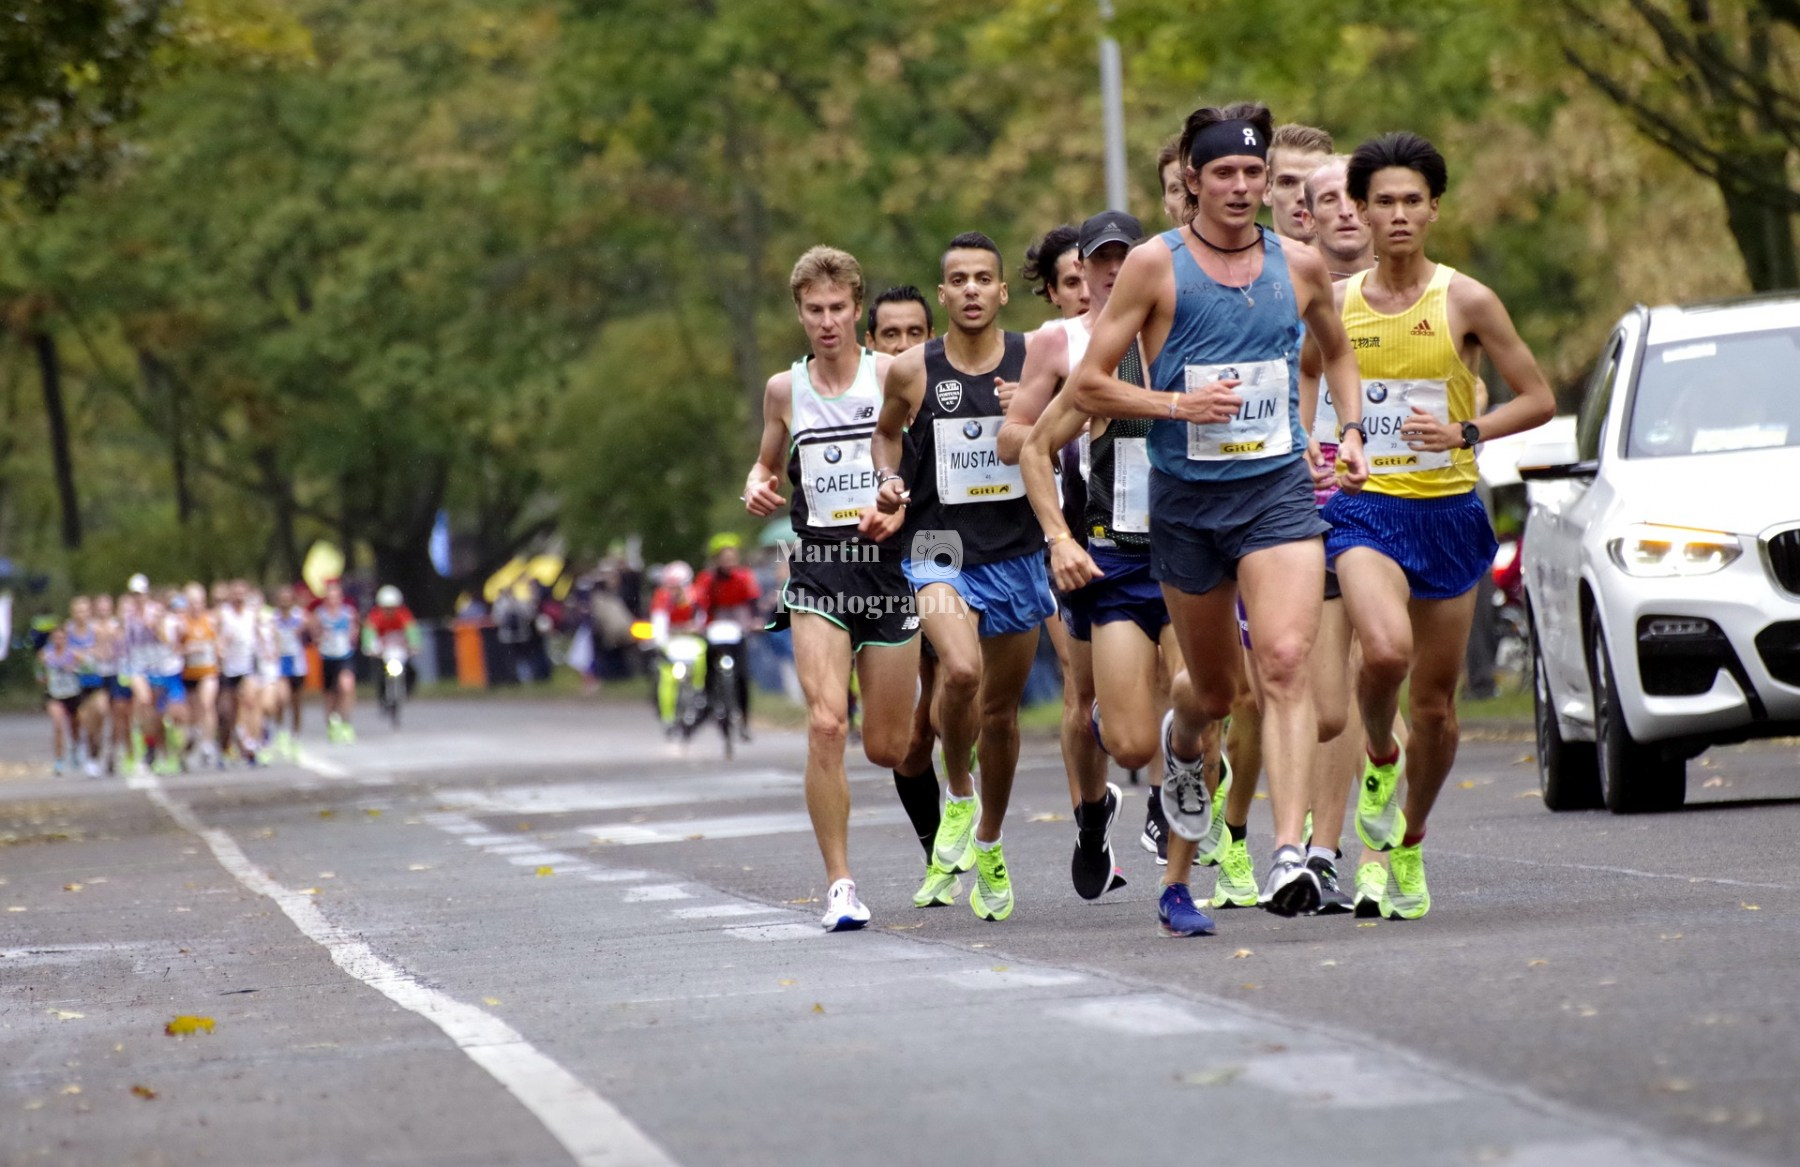 marathon-4646827_1920